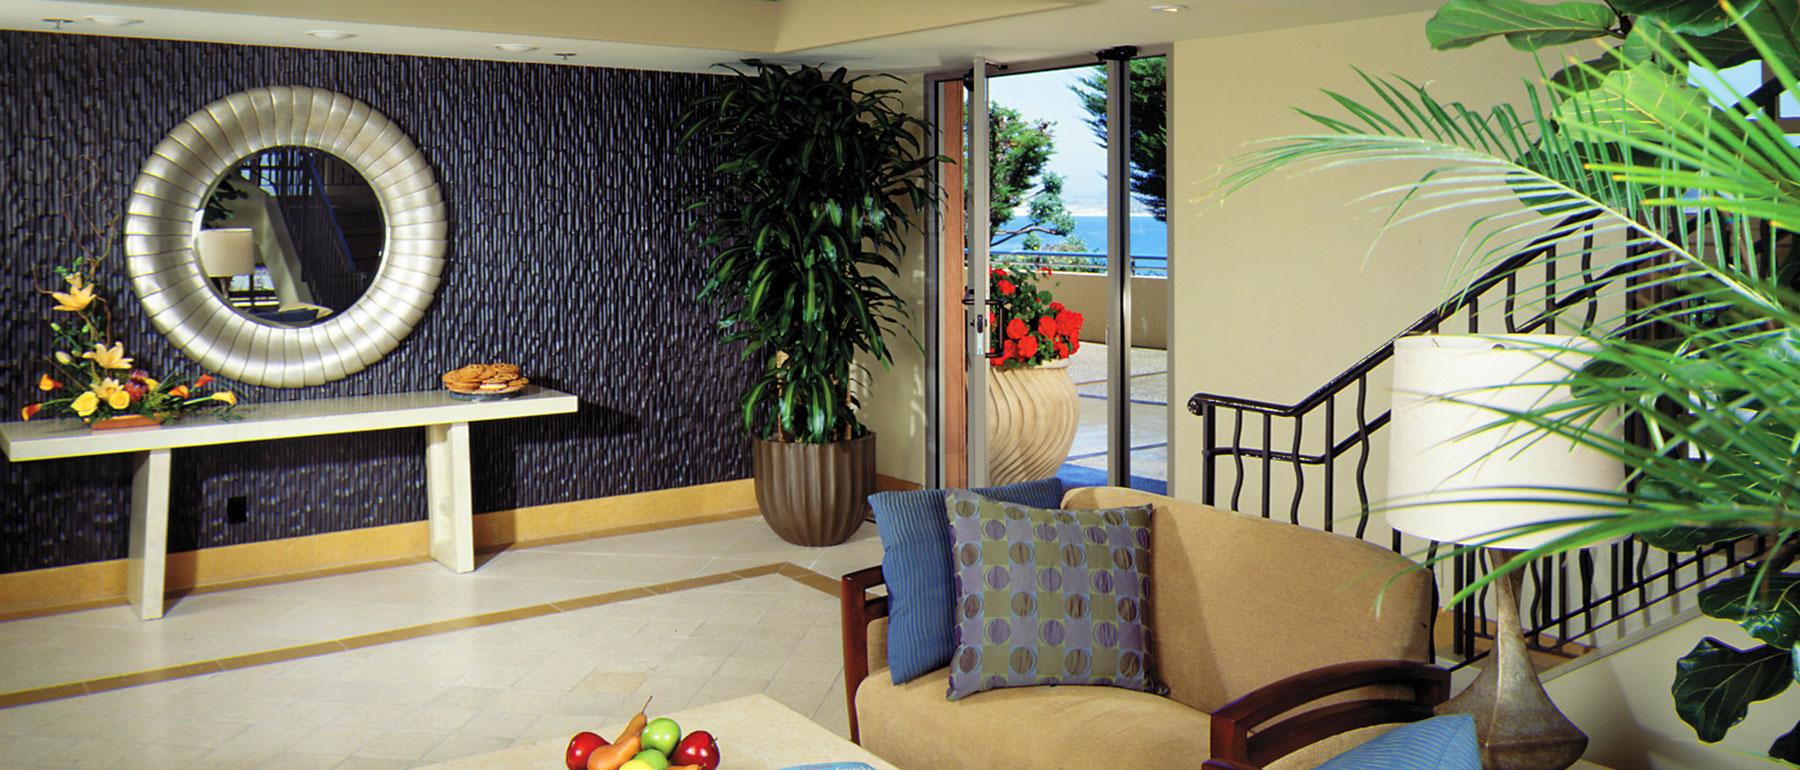 Gallery of Monterey Hotel